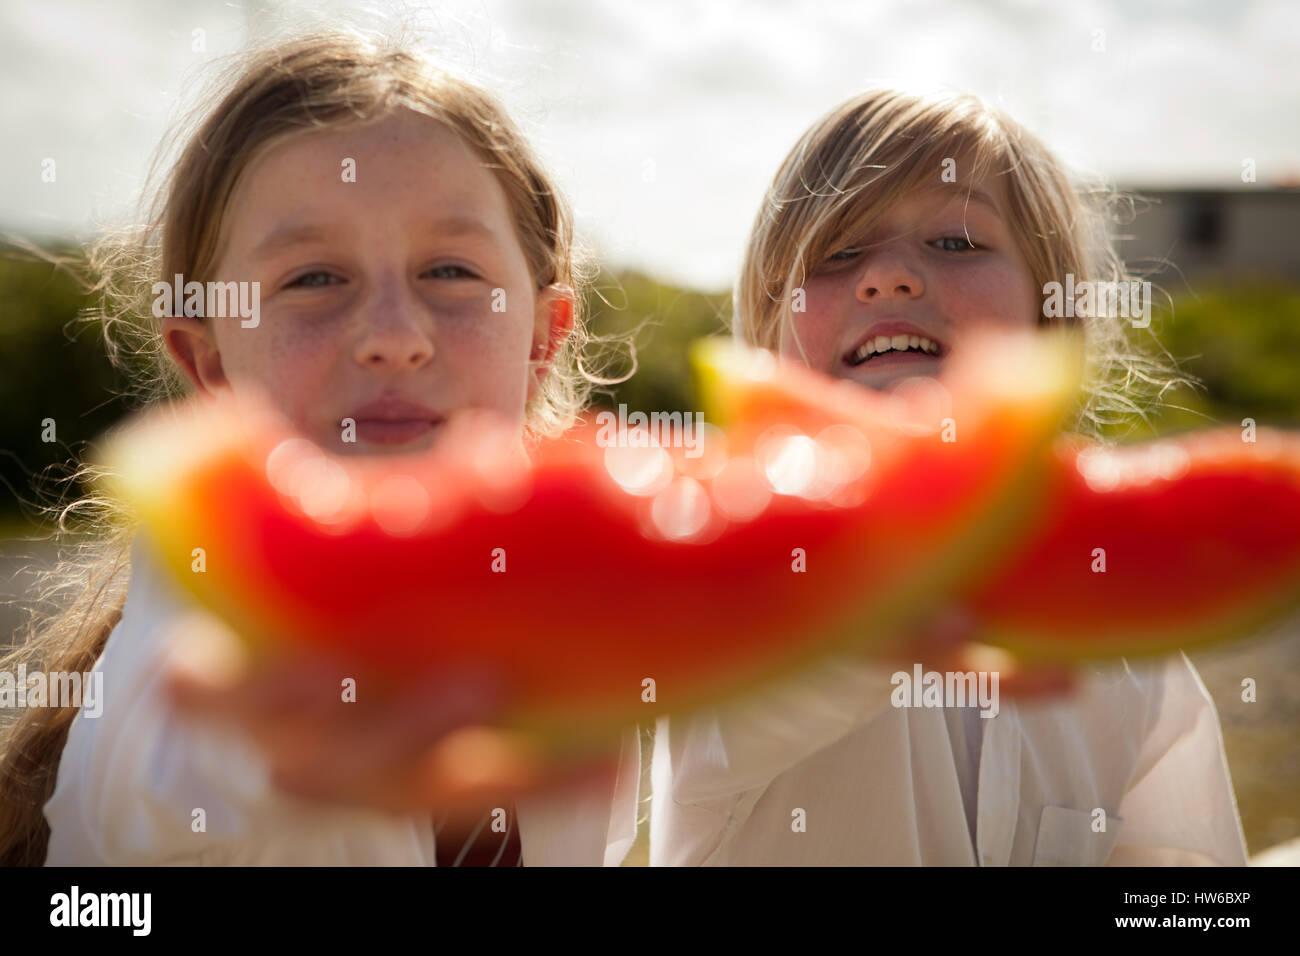 Girls eating watermelon - Stock Image